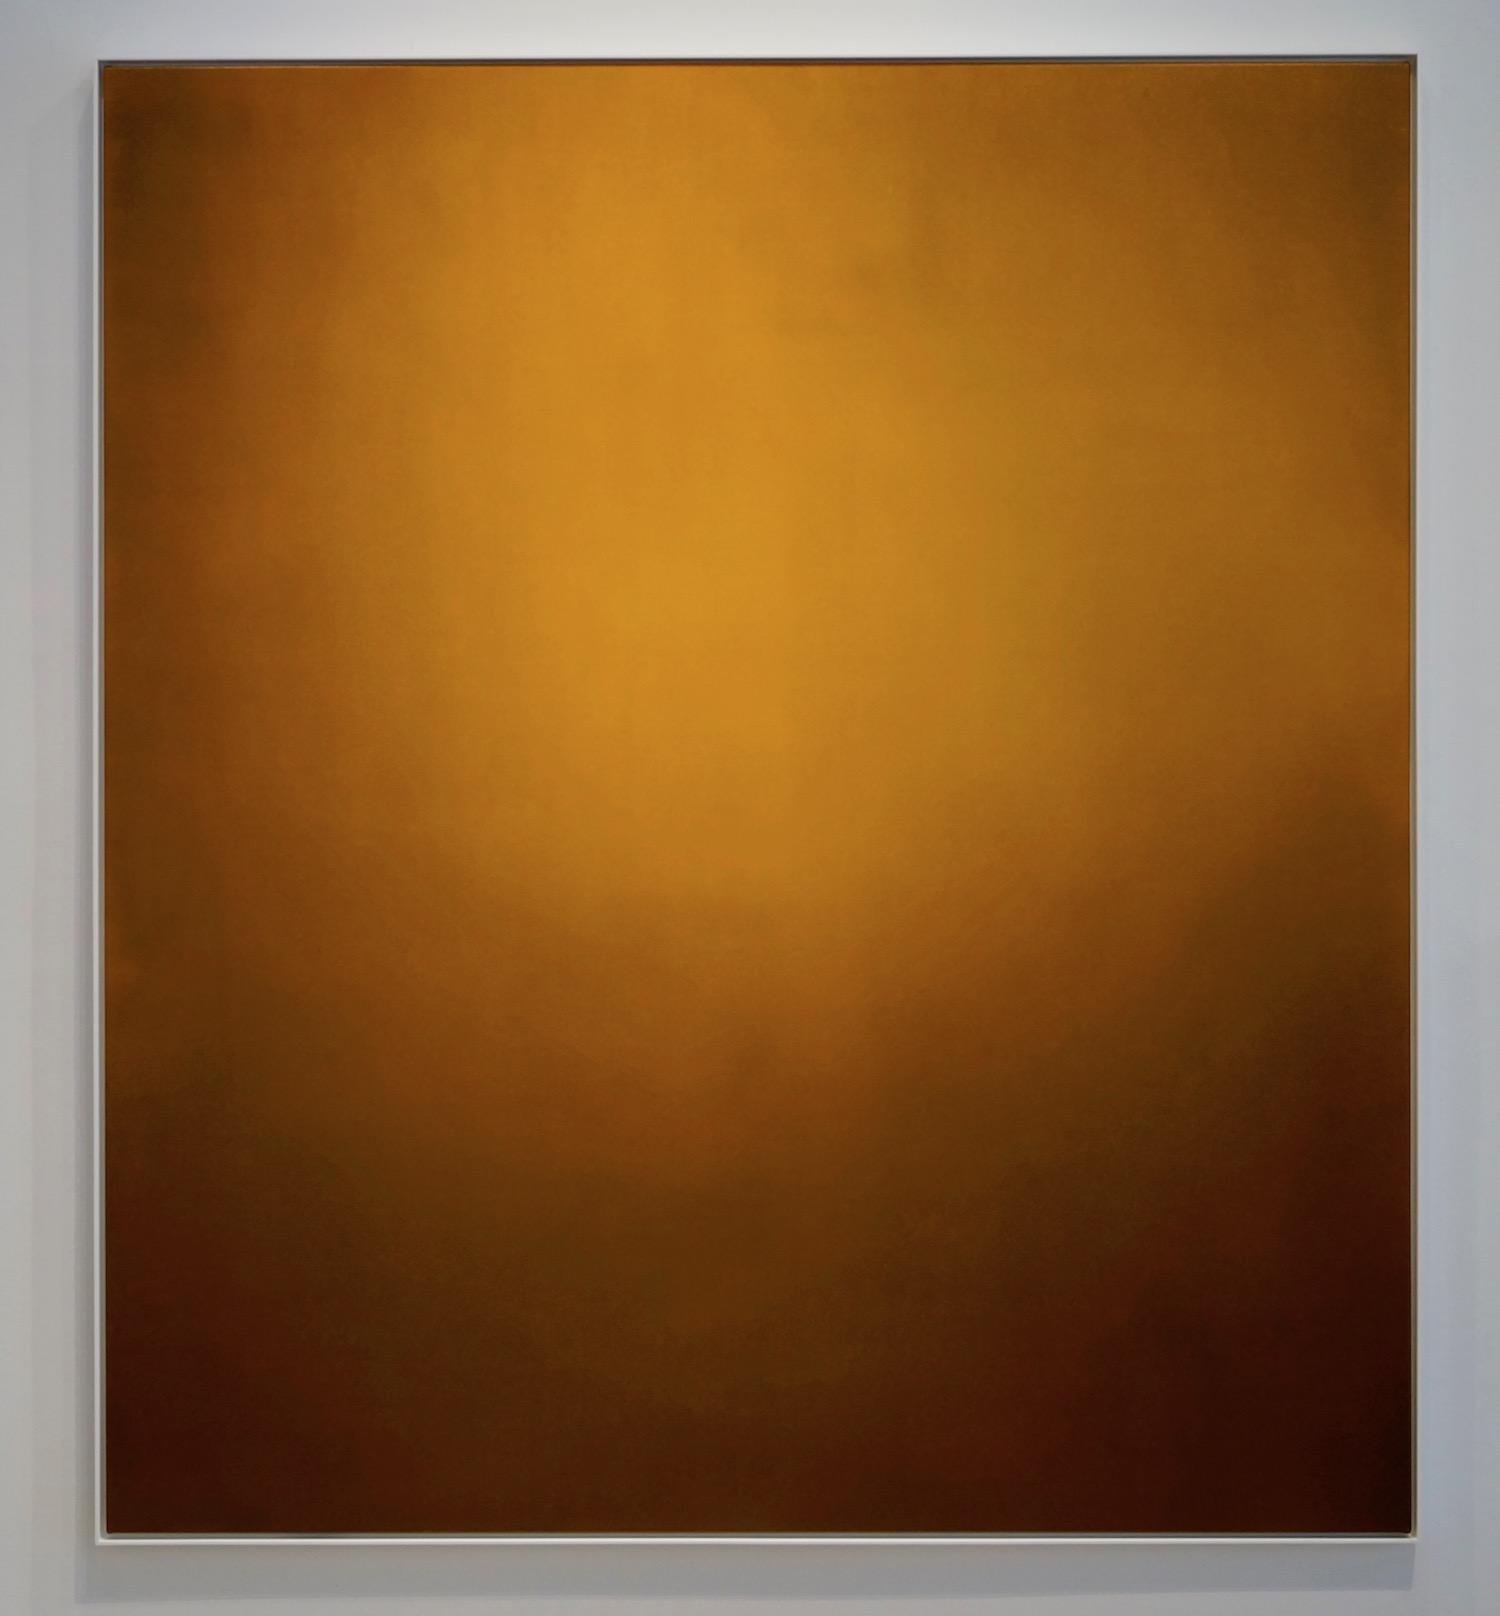 Magnus Thorén Ohne Titel, 2016 oil on canvas 180 x 160 cm | 70 3/4 x 63 in MTH/M 55